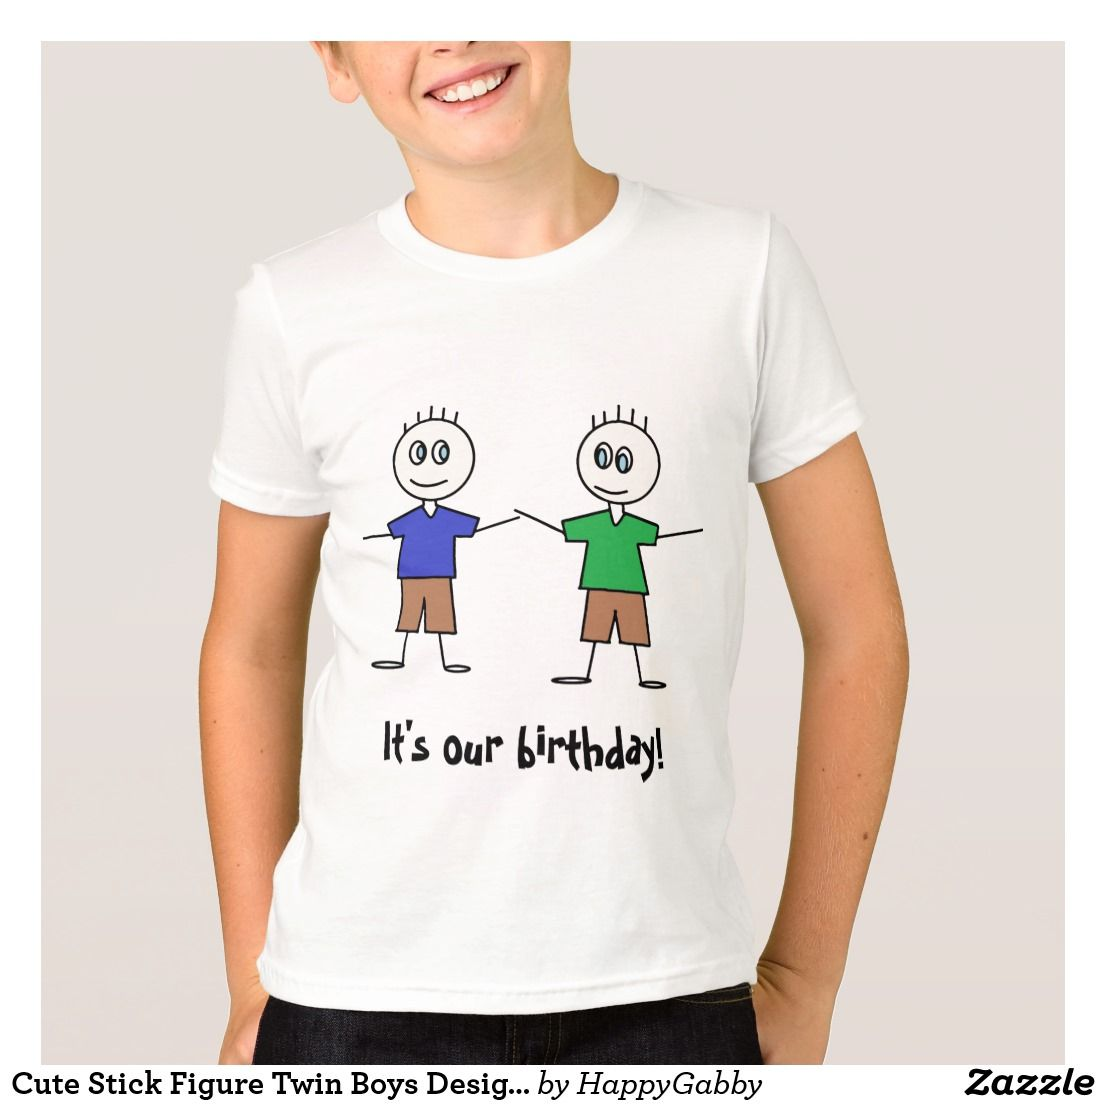 Design t shirt zazzle - Cute Stick Figure Twin Boys Design Birthday T Shirt